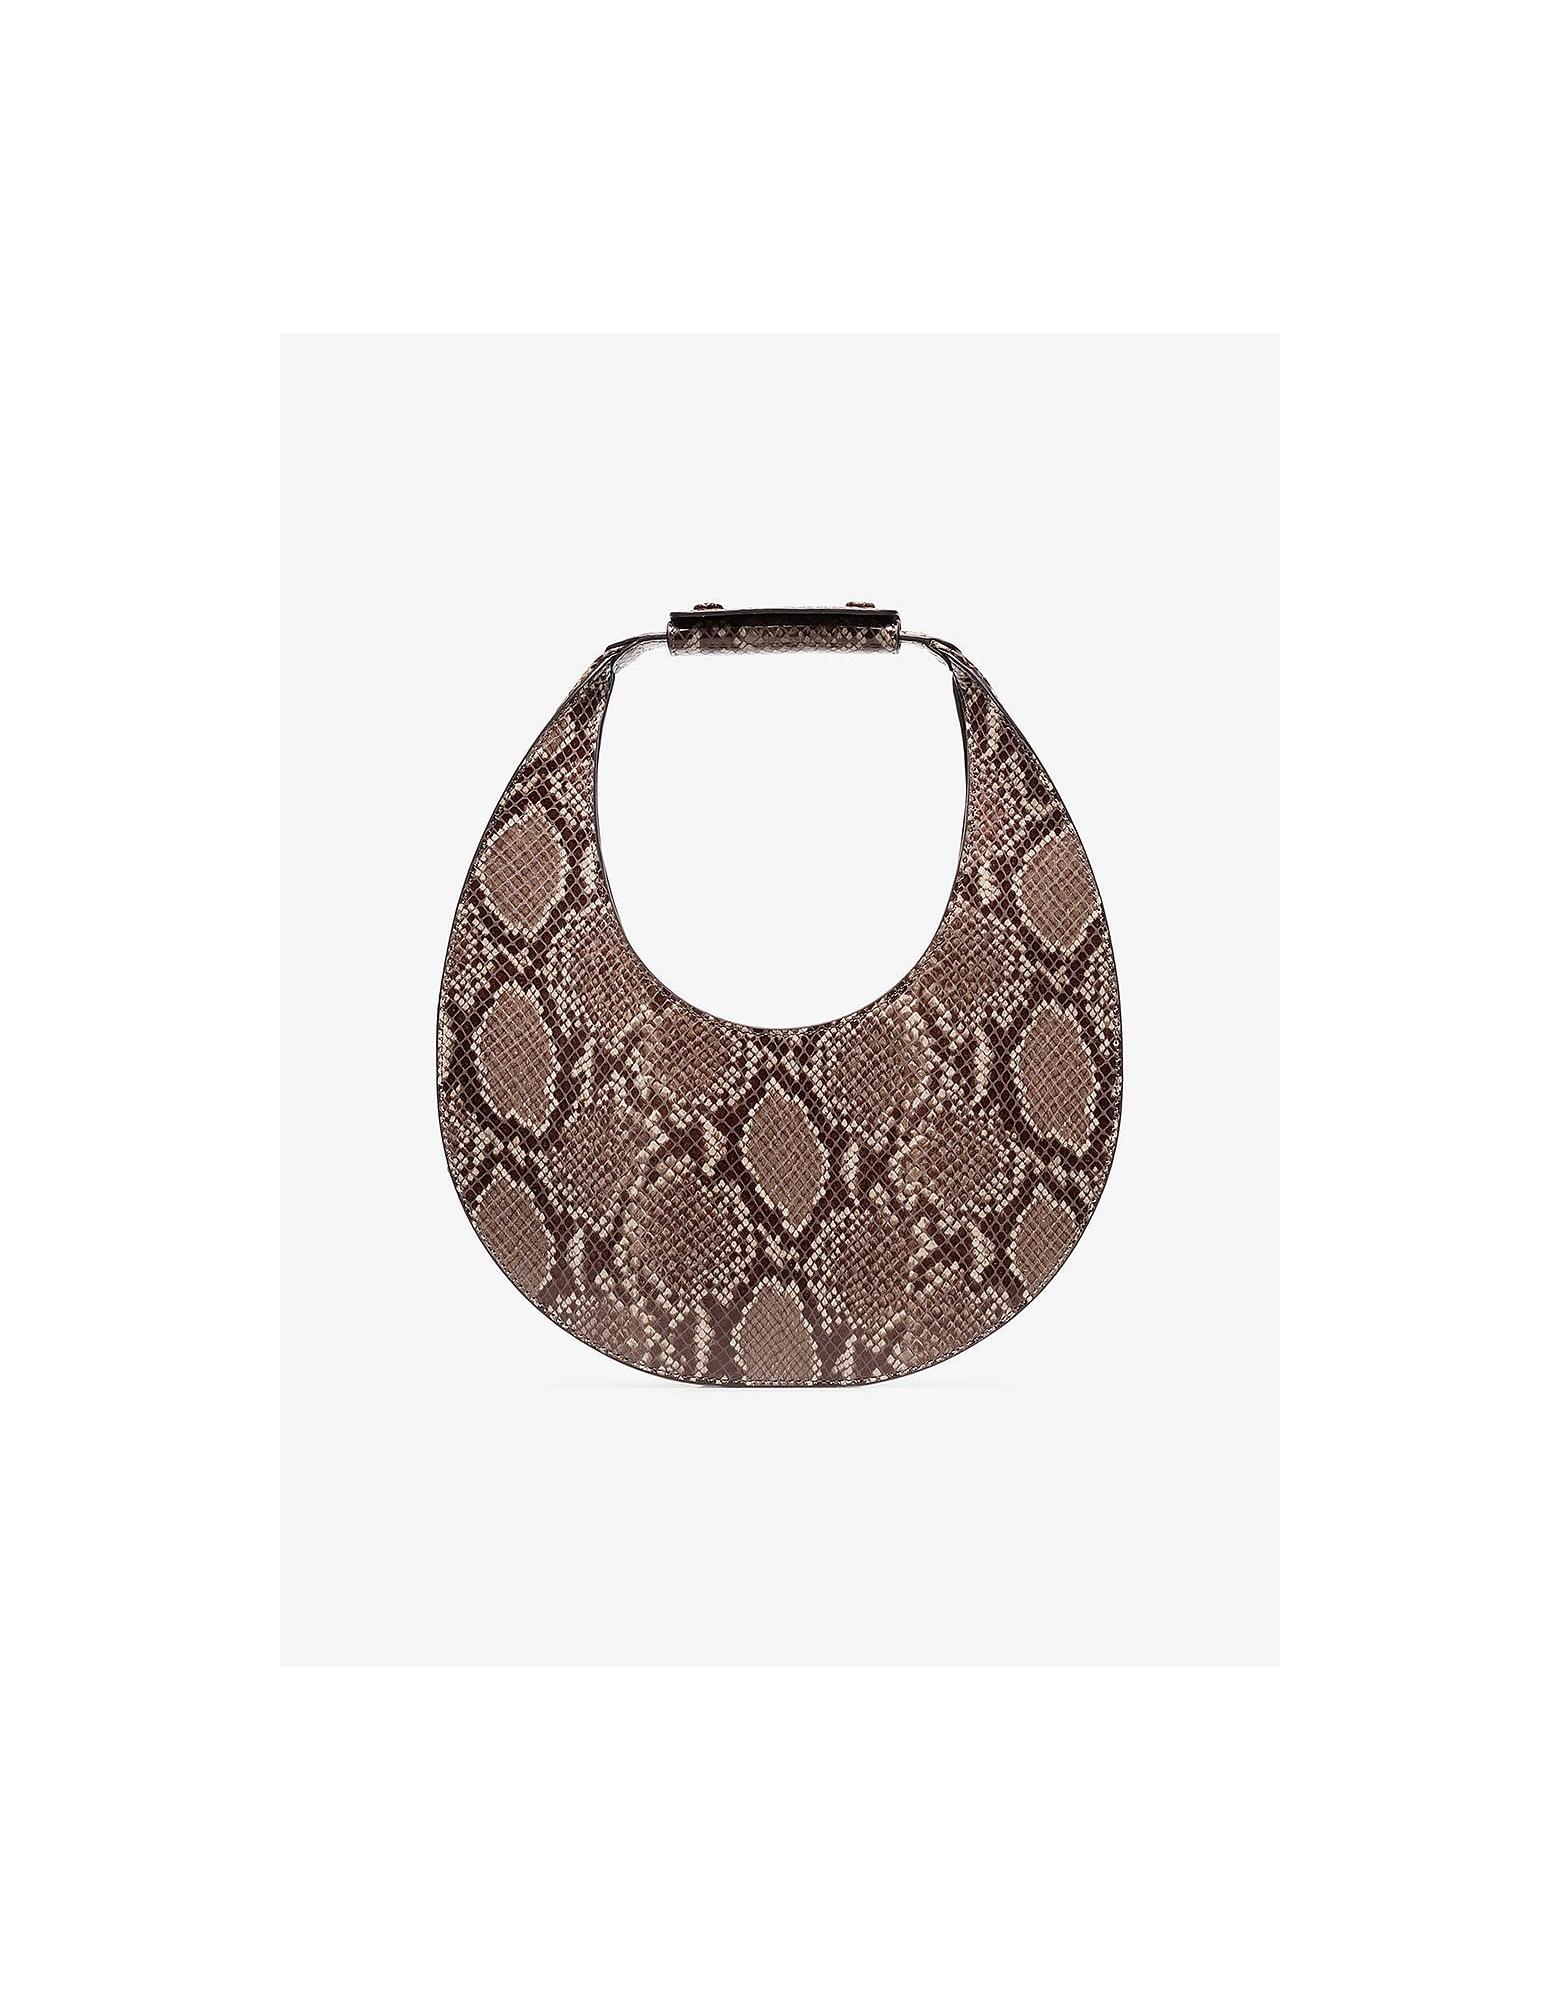 Staud Designer Handbags, Moon Snake Embossed Leather Shoulder Bag